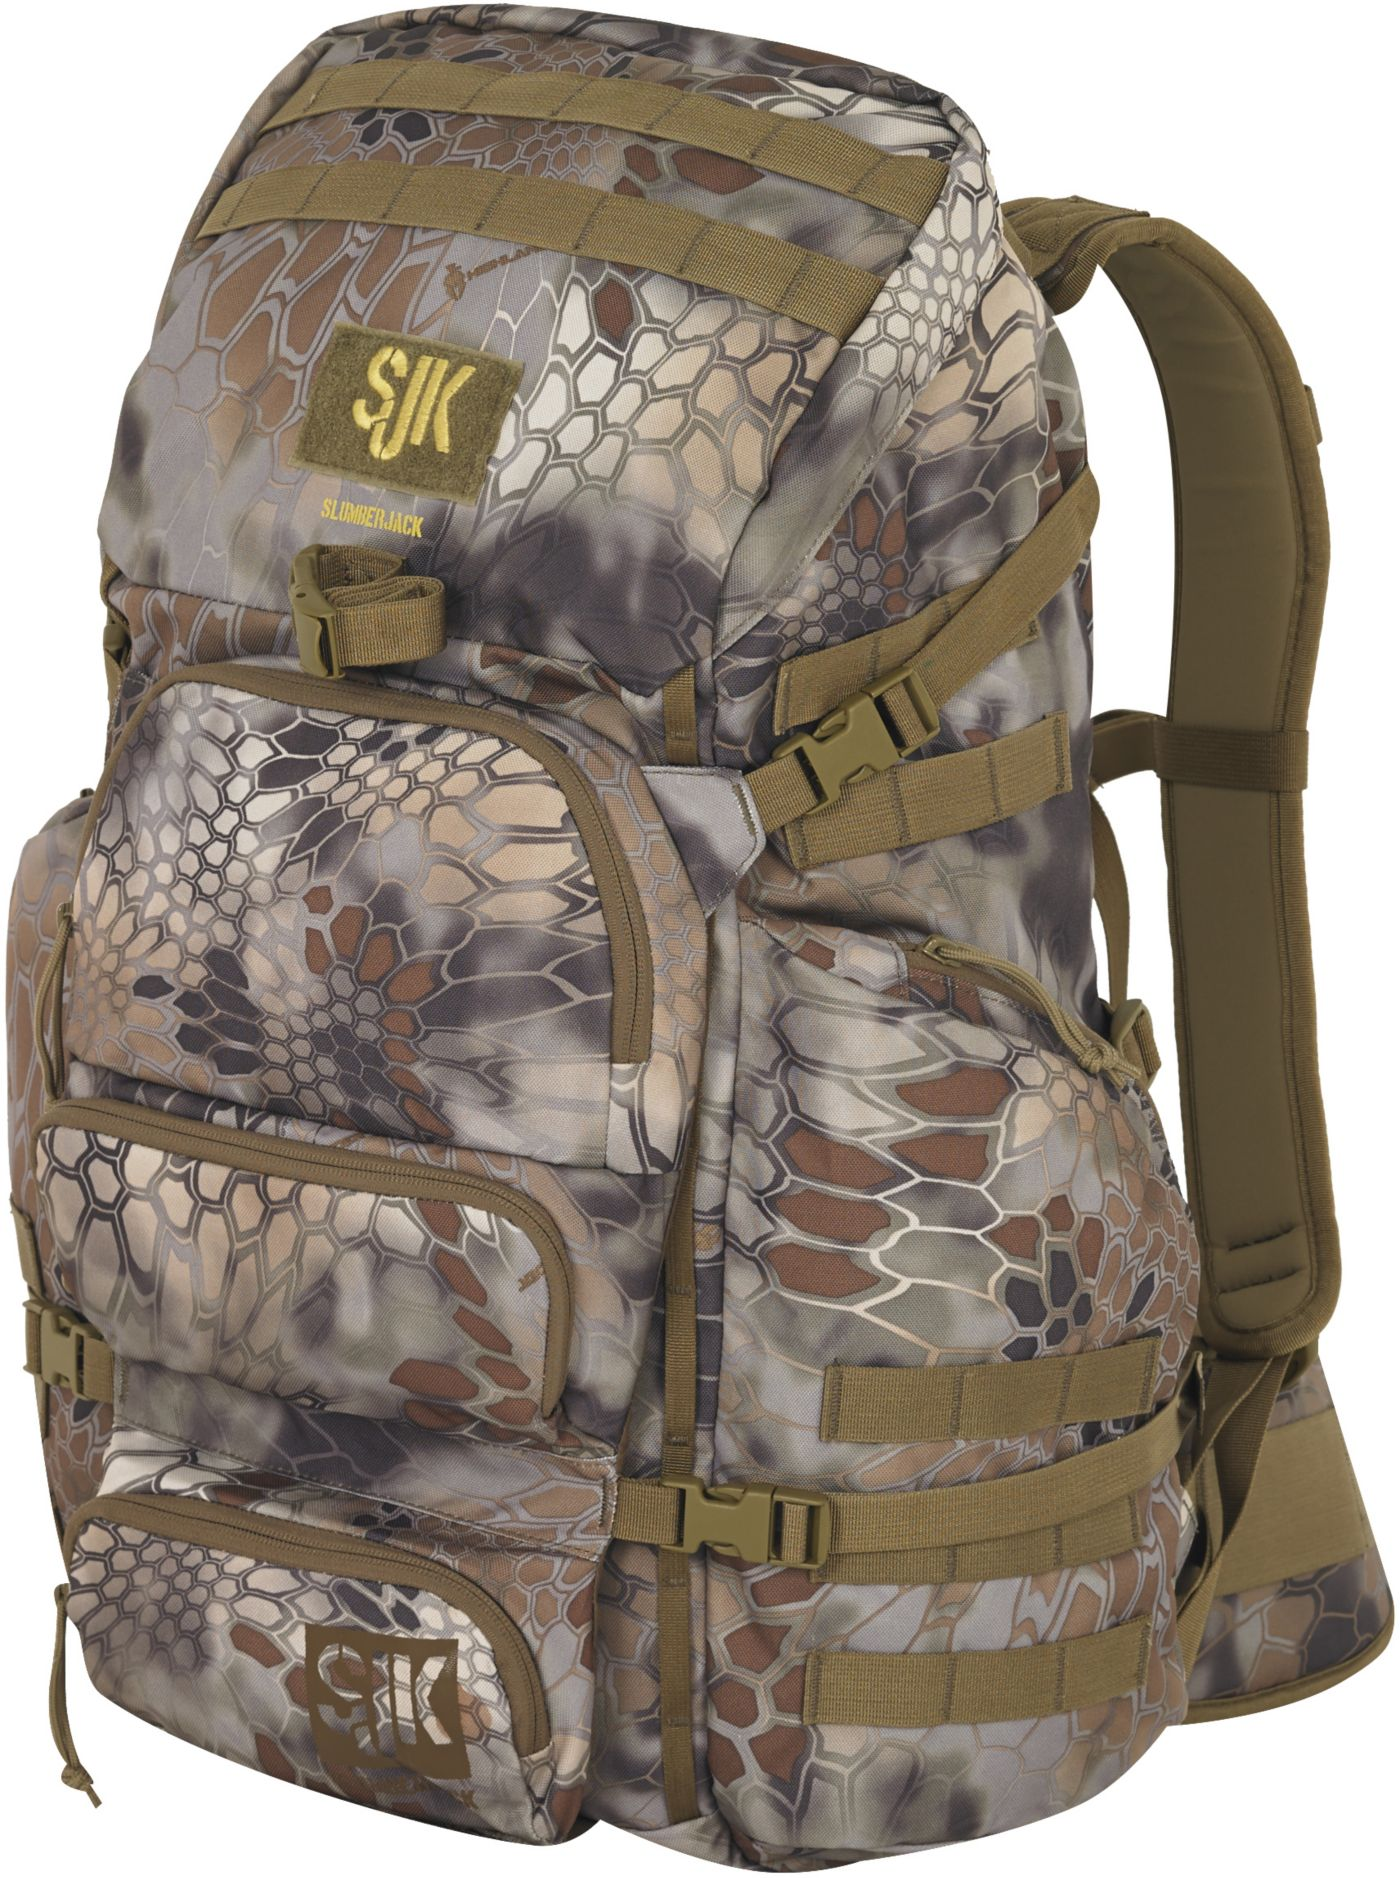 Slumberjack Carbine 40L Hunting Backpack